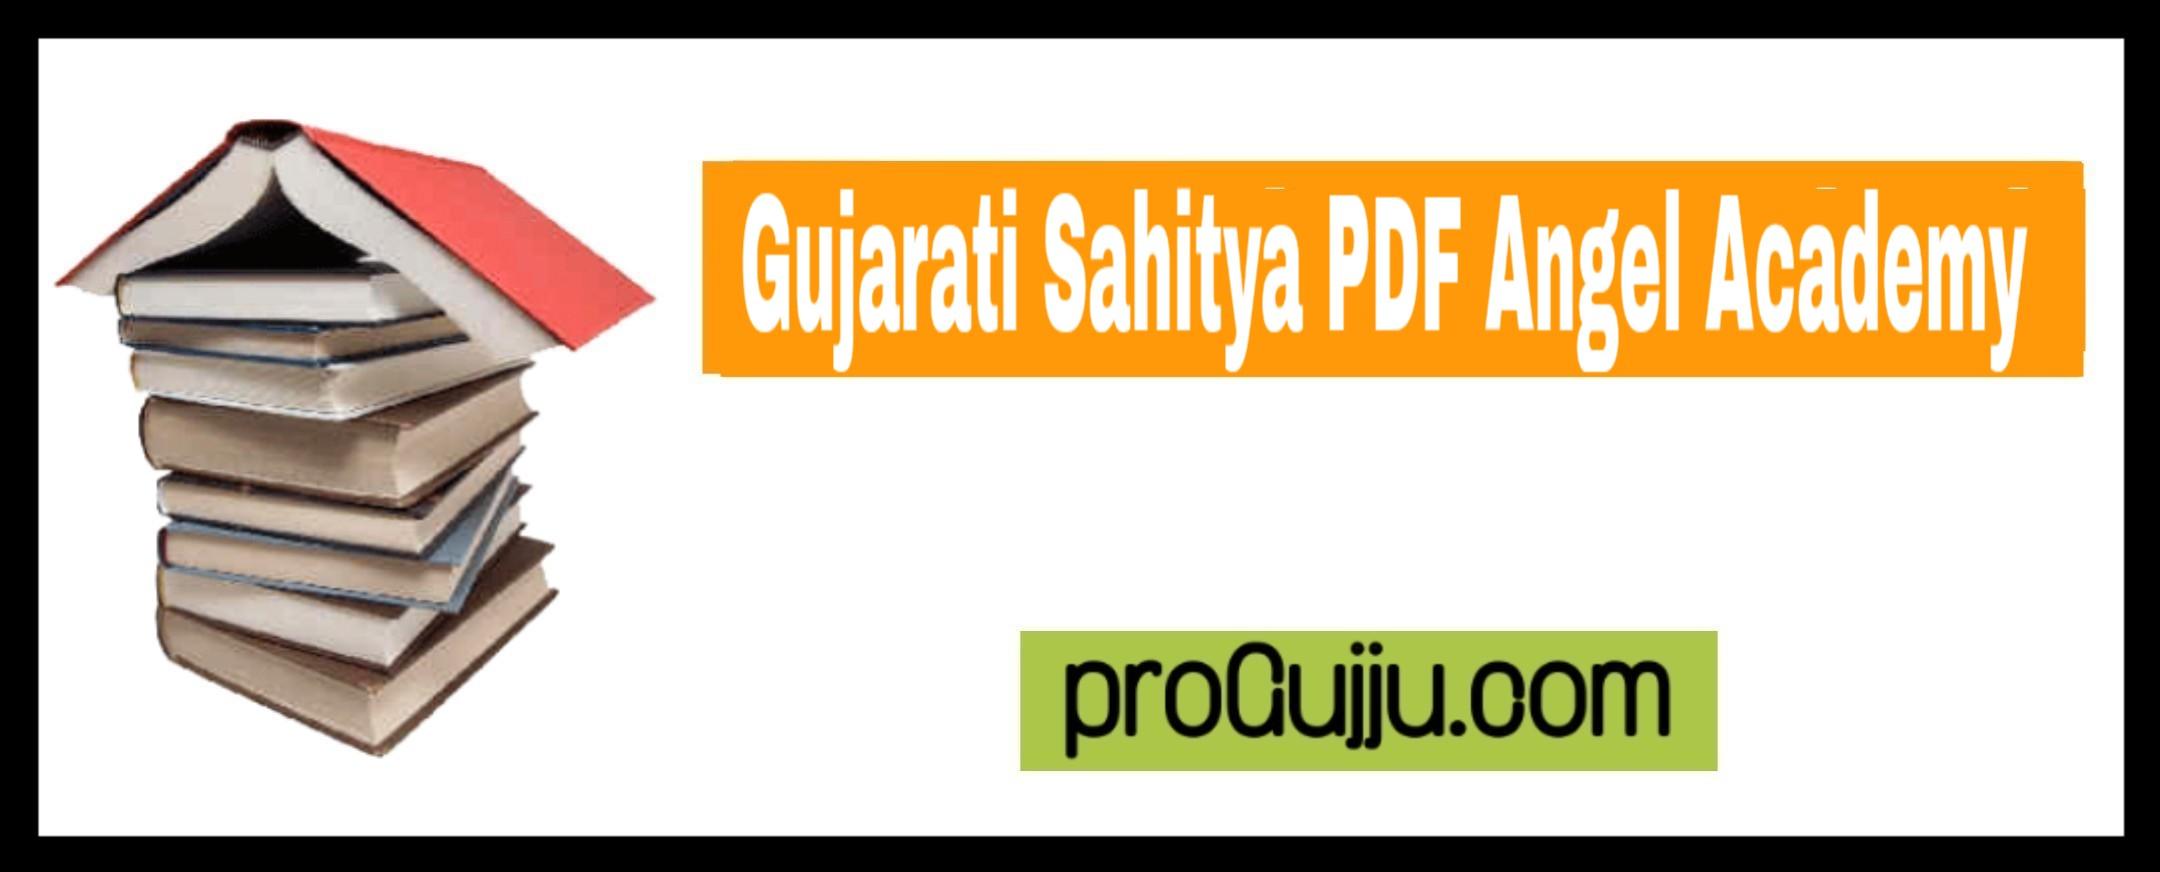 Gujarati Sahitya PDF Angel Academy